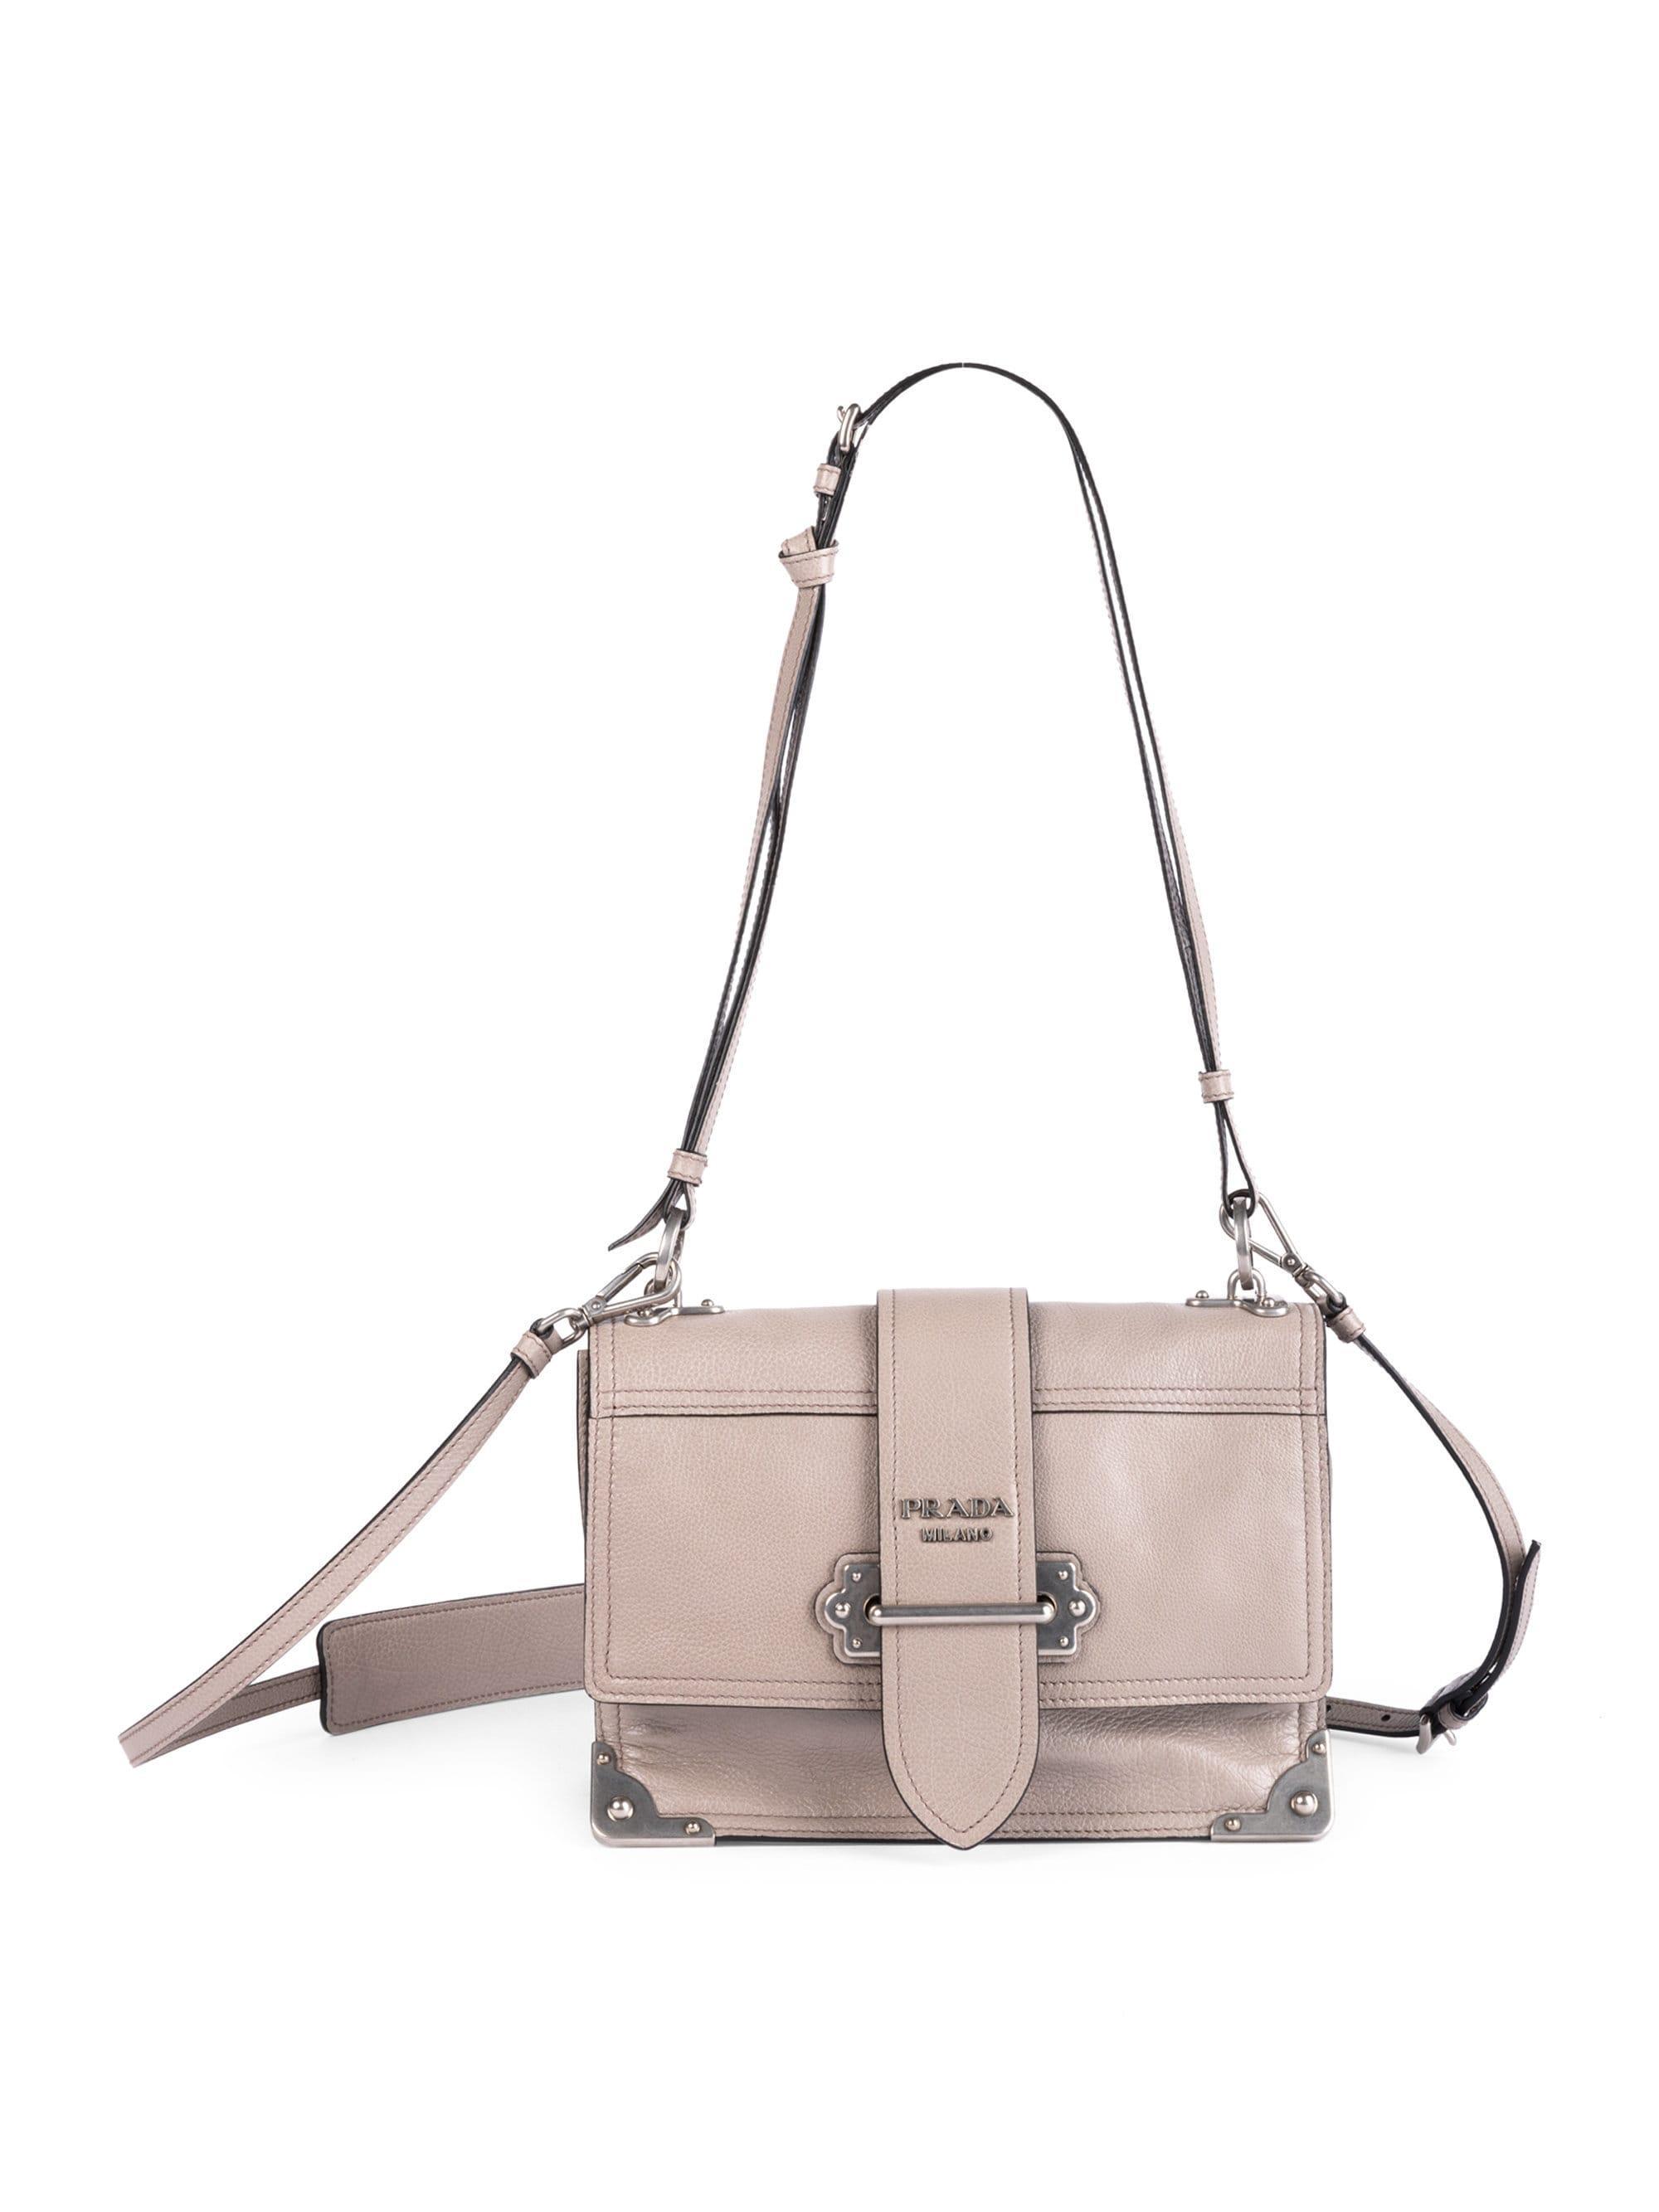 89276226e15b Prada Large Soft Cahier Shoulder Bag - Lyst